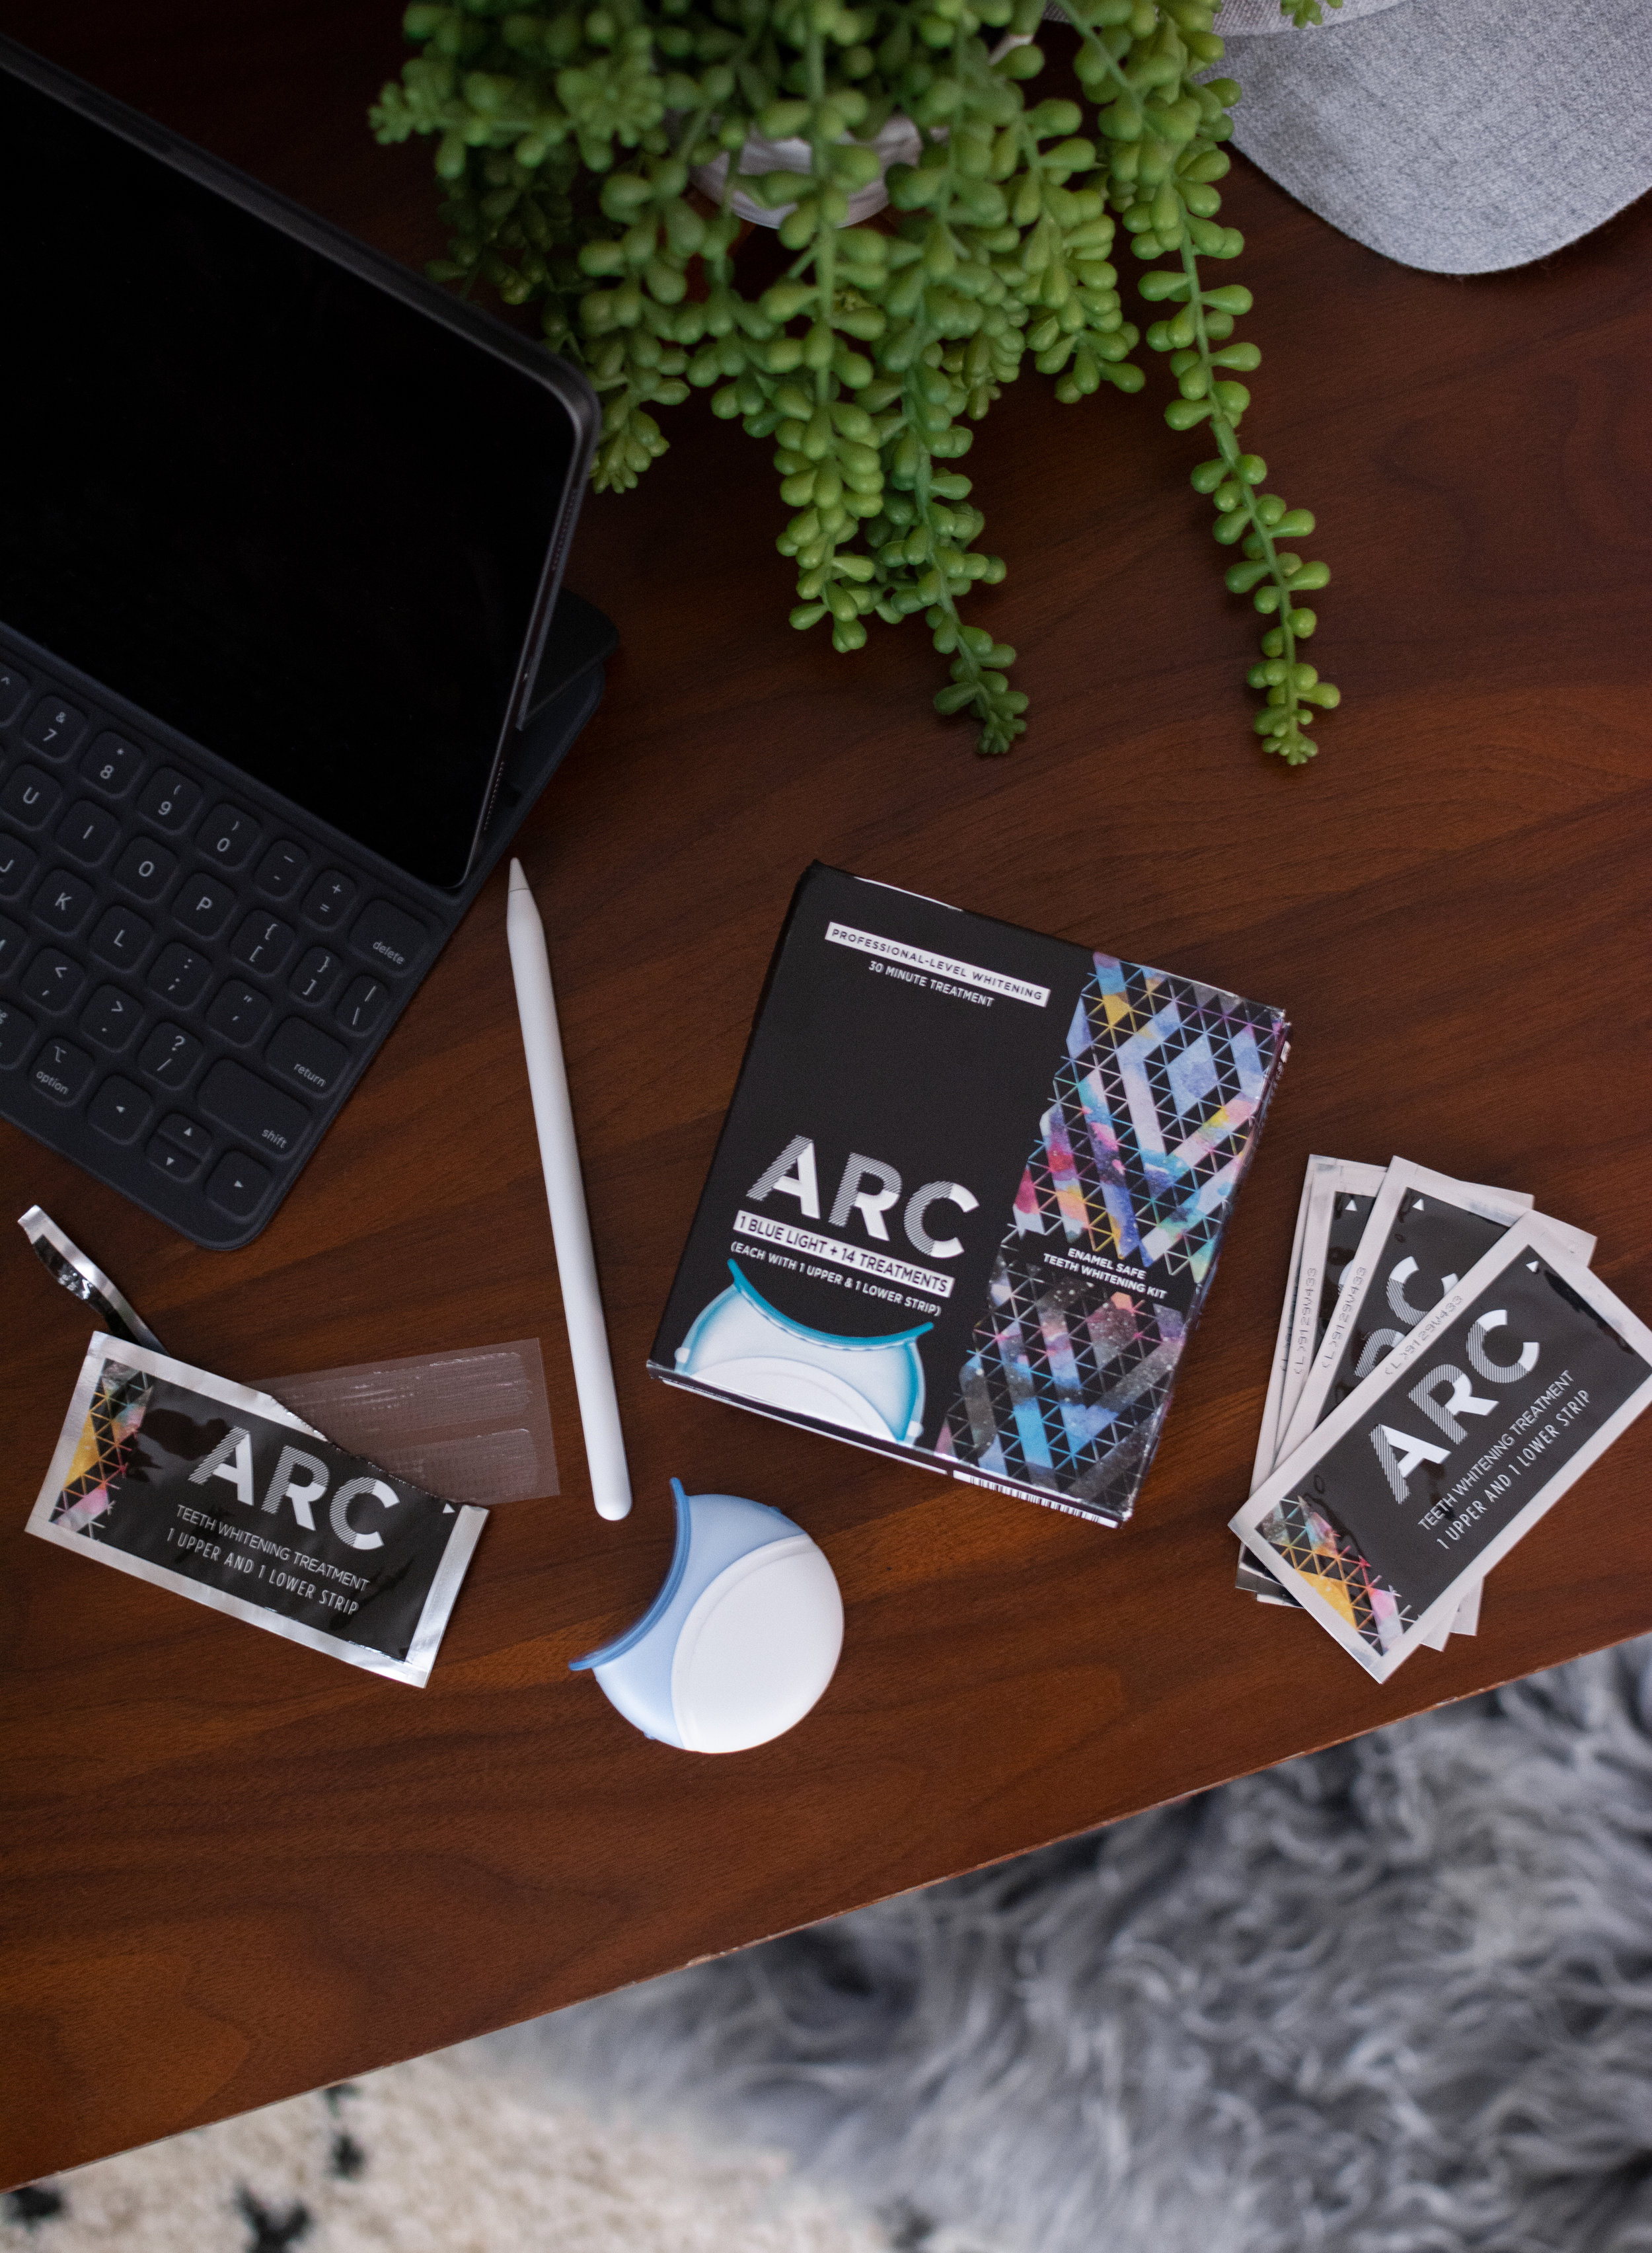 ARC Teeth Whitening | The Modern Otter